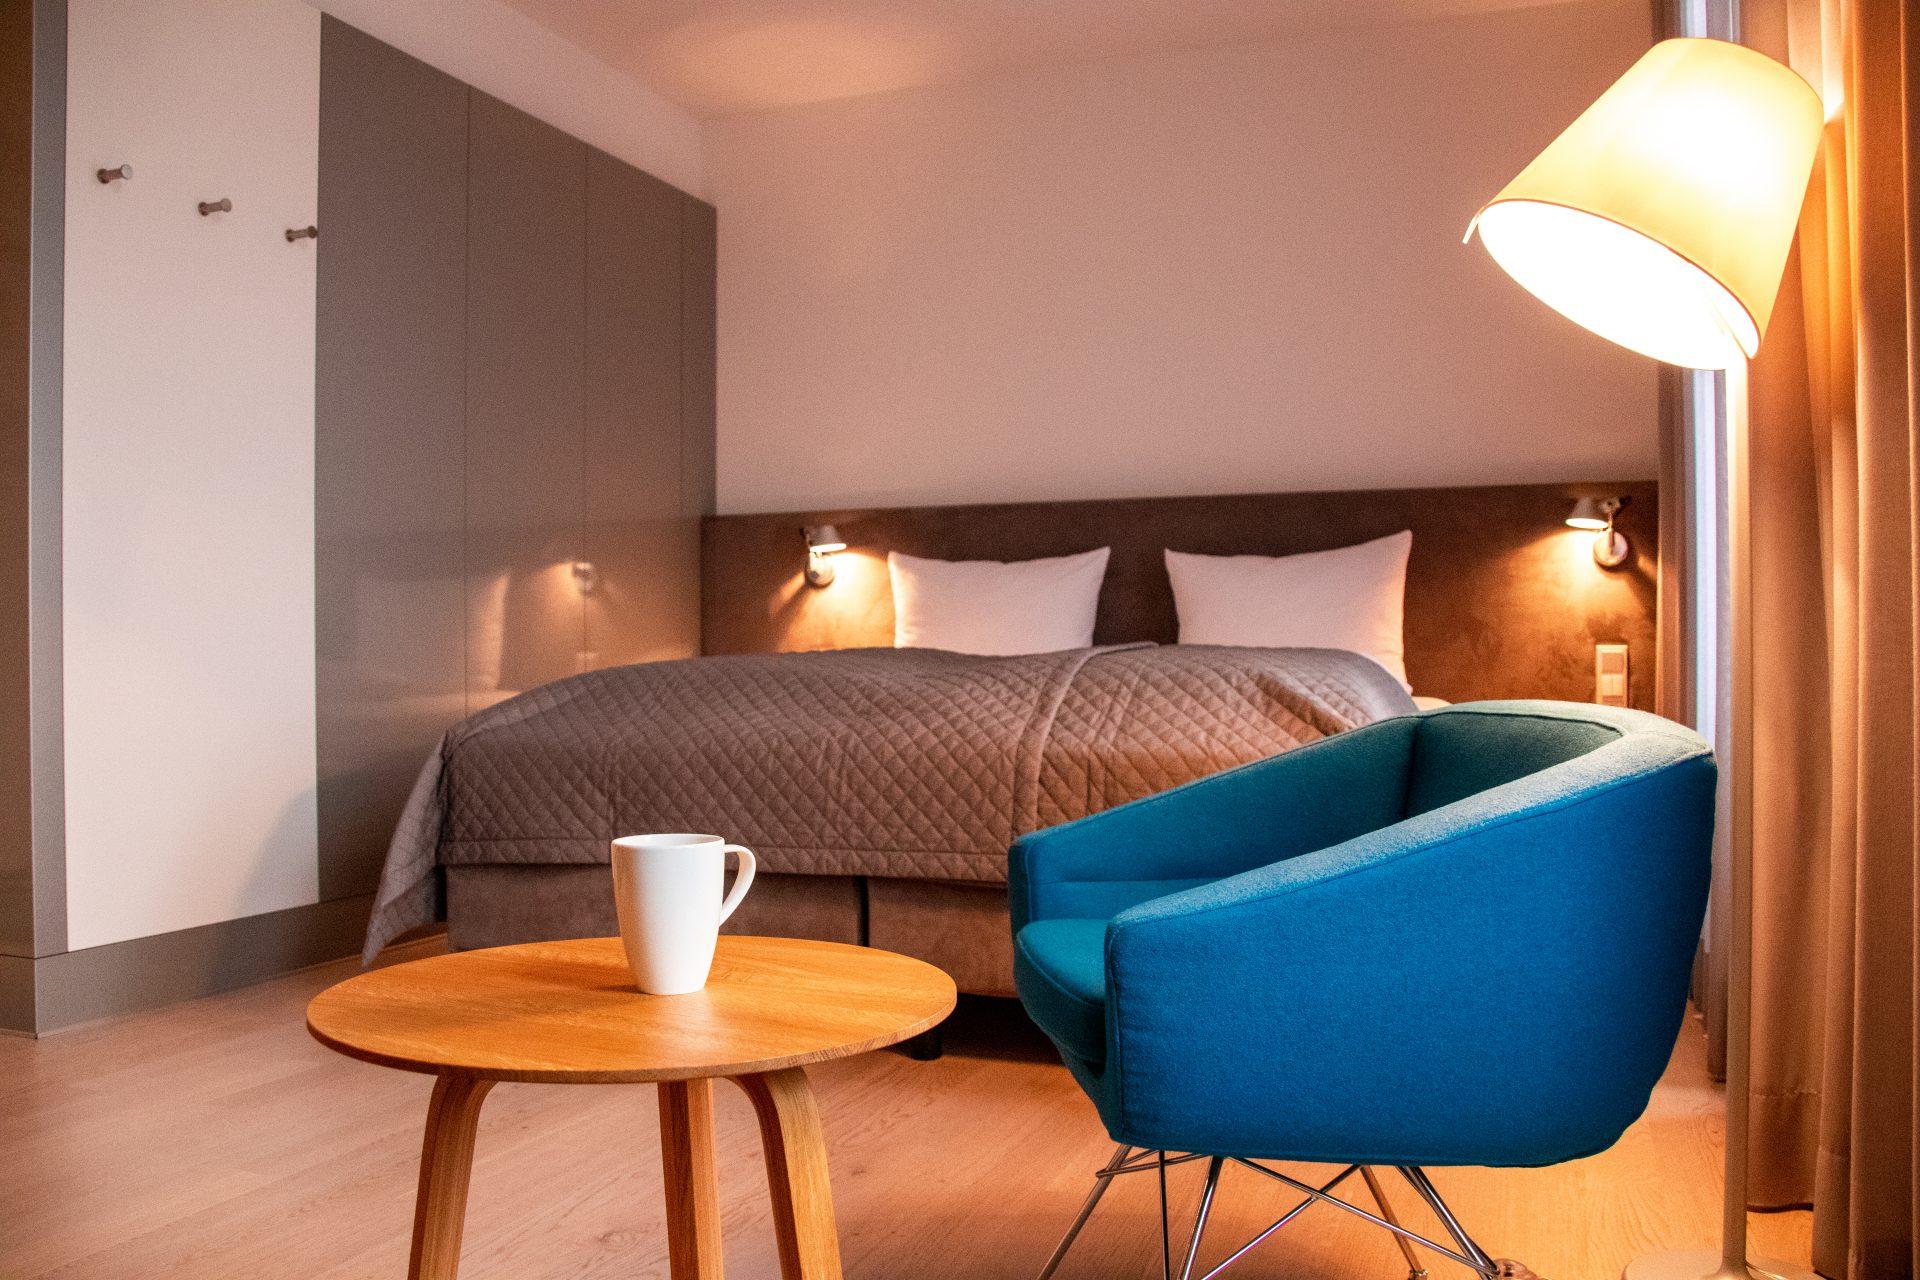 Maximilians-Boutique-Hotel-Landau-stuhl-bett